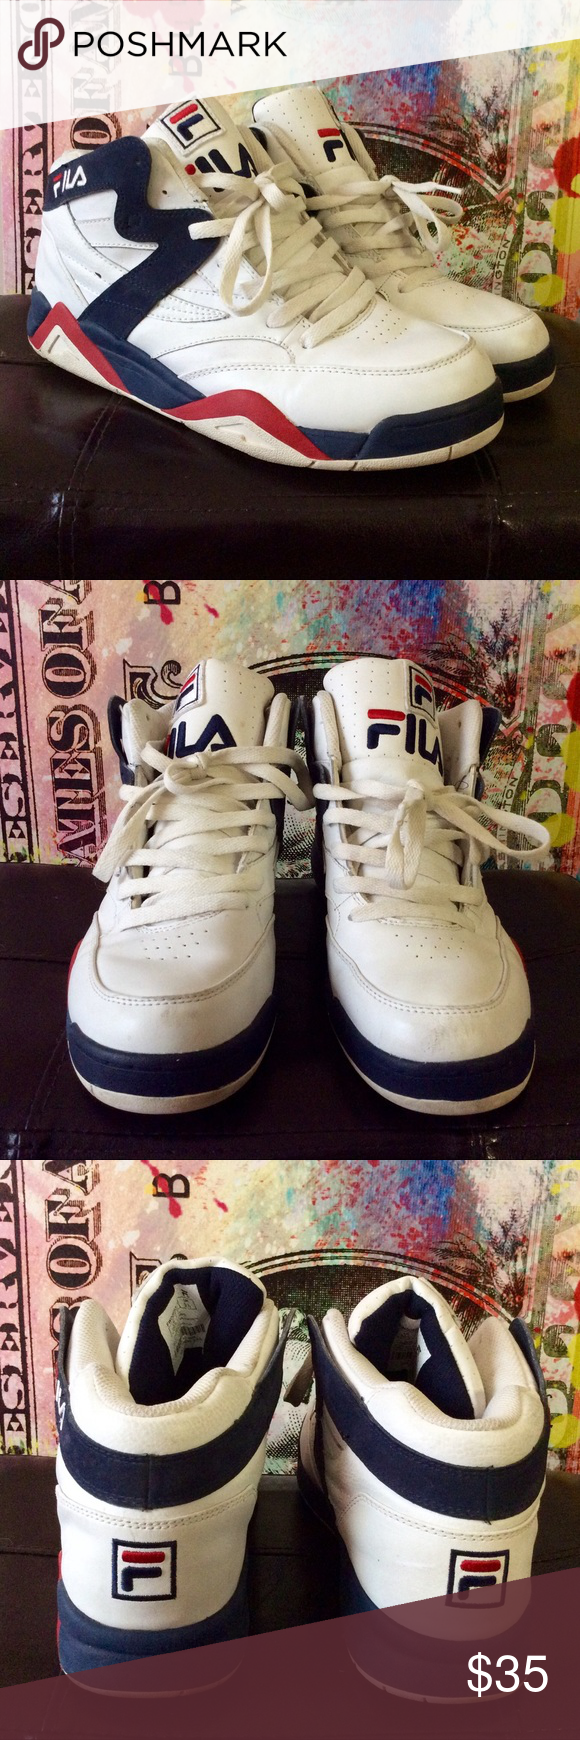 buy clothes shoes online 38